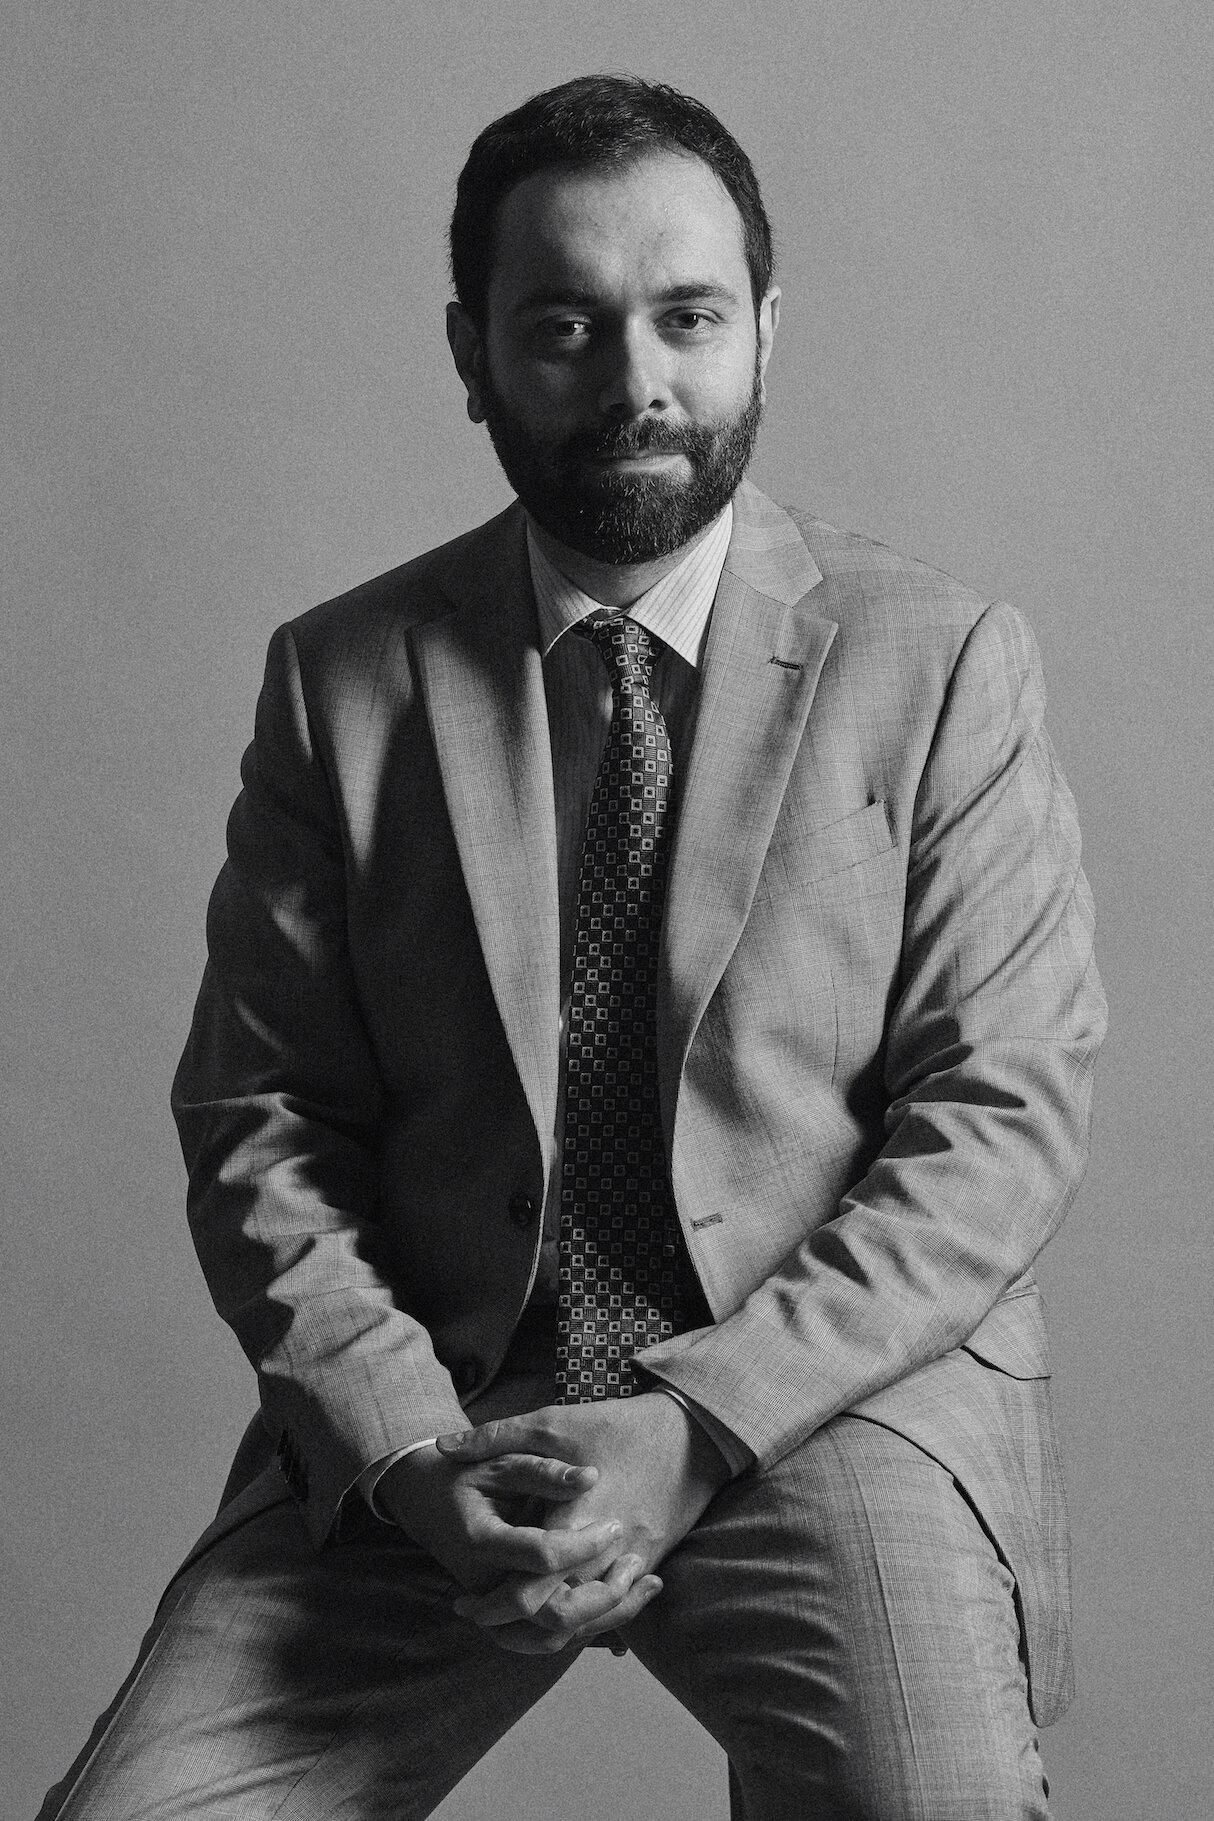 L'avvocato Matteo Di Francesco, responsabile dipartimento del lavoro Jenny.Avvocati